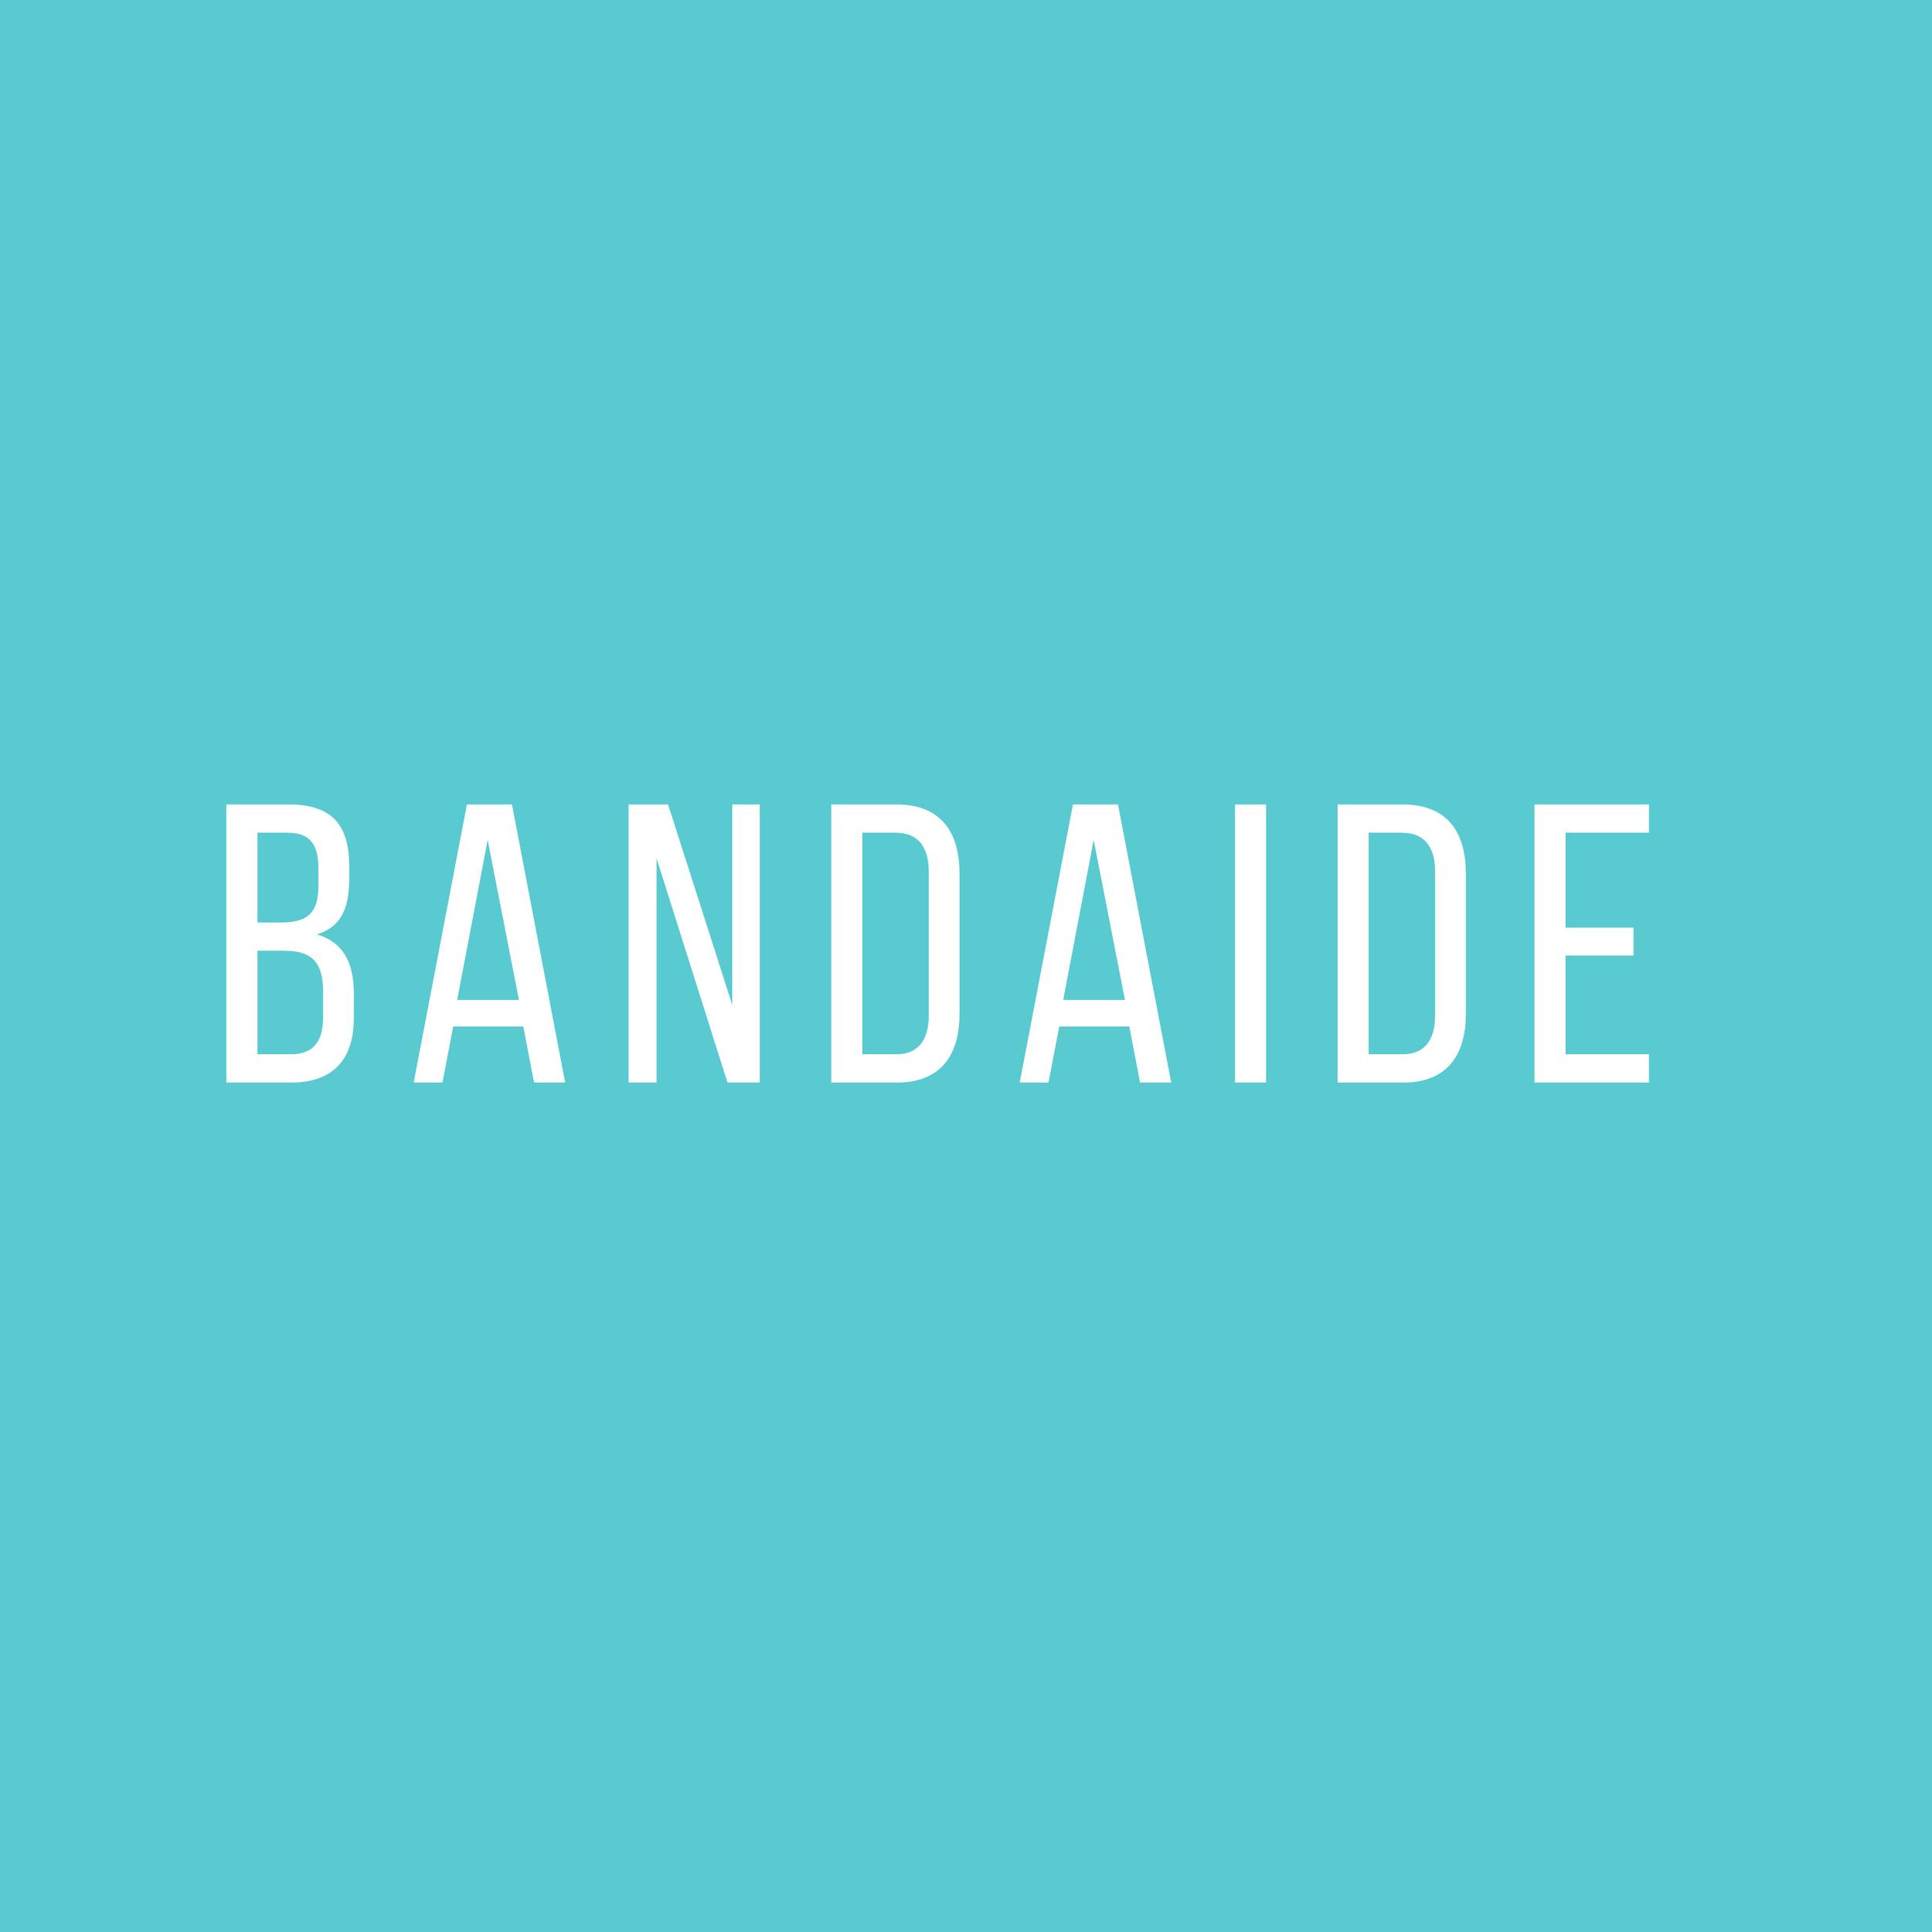 bandaide logo 1sq.jpg